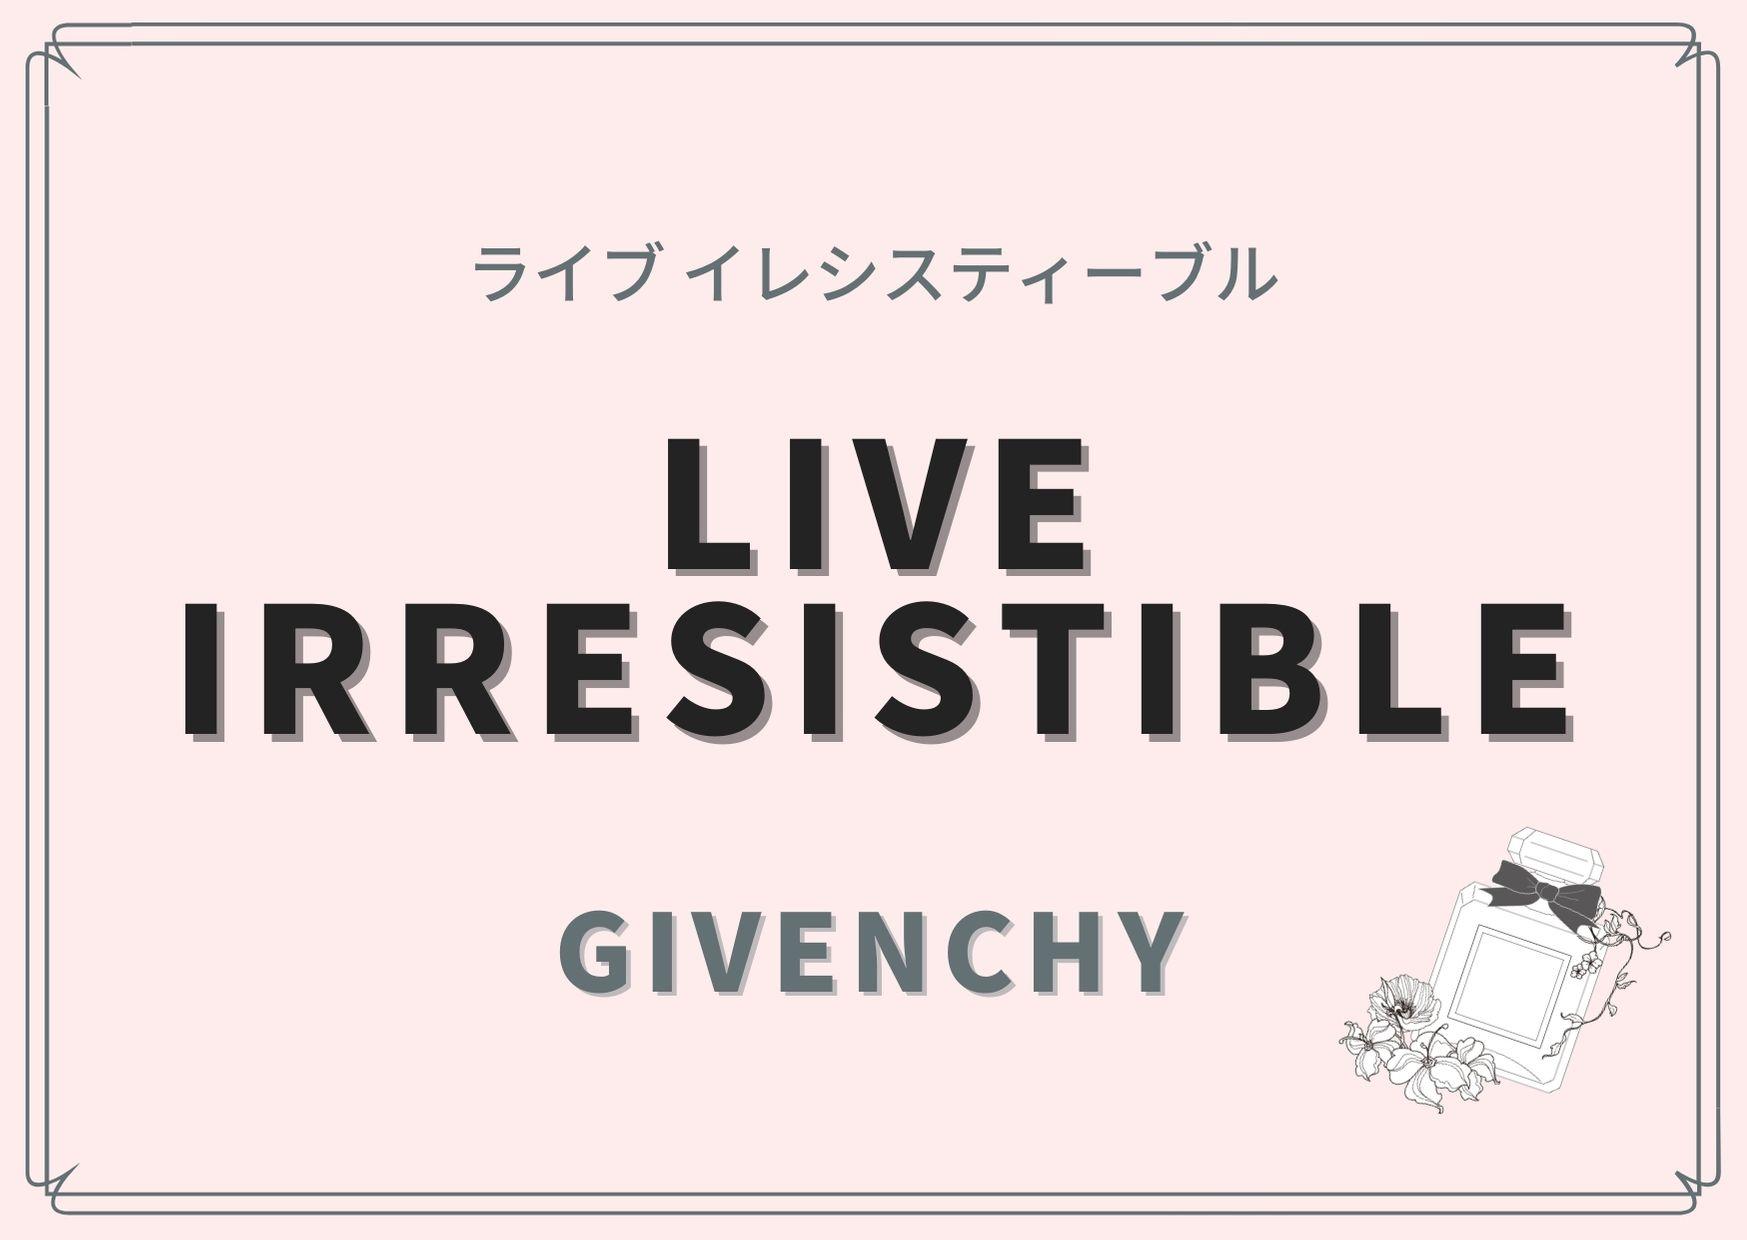 LIVE IRRESISTIBLE(ライブ イレシスティーブル)/GIVENCHY(ジバンシィ)